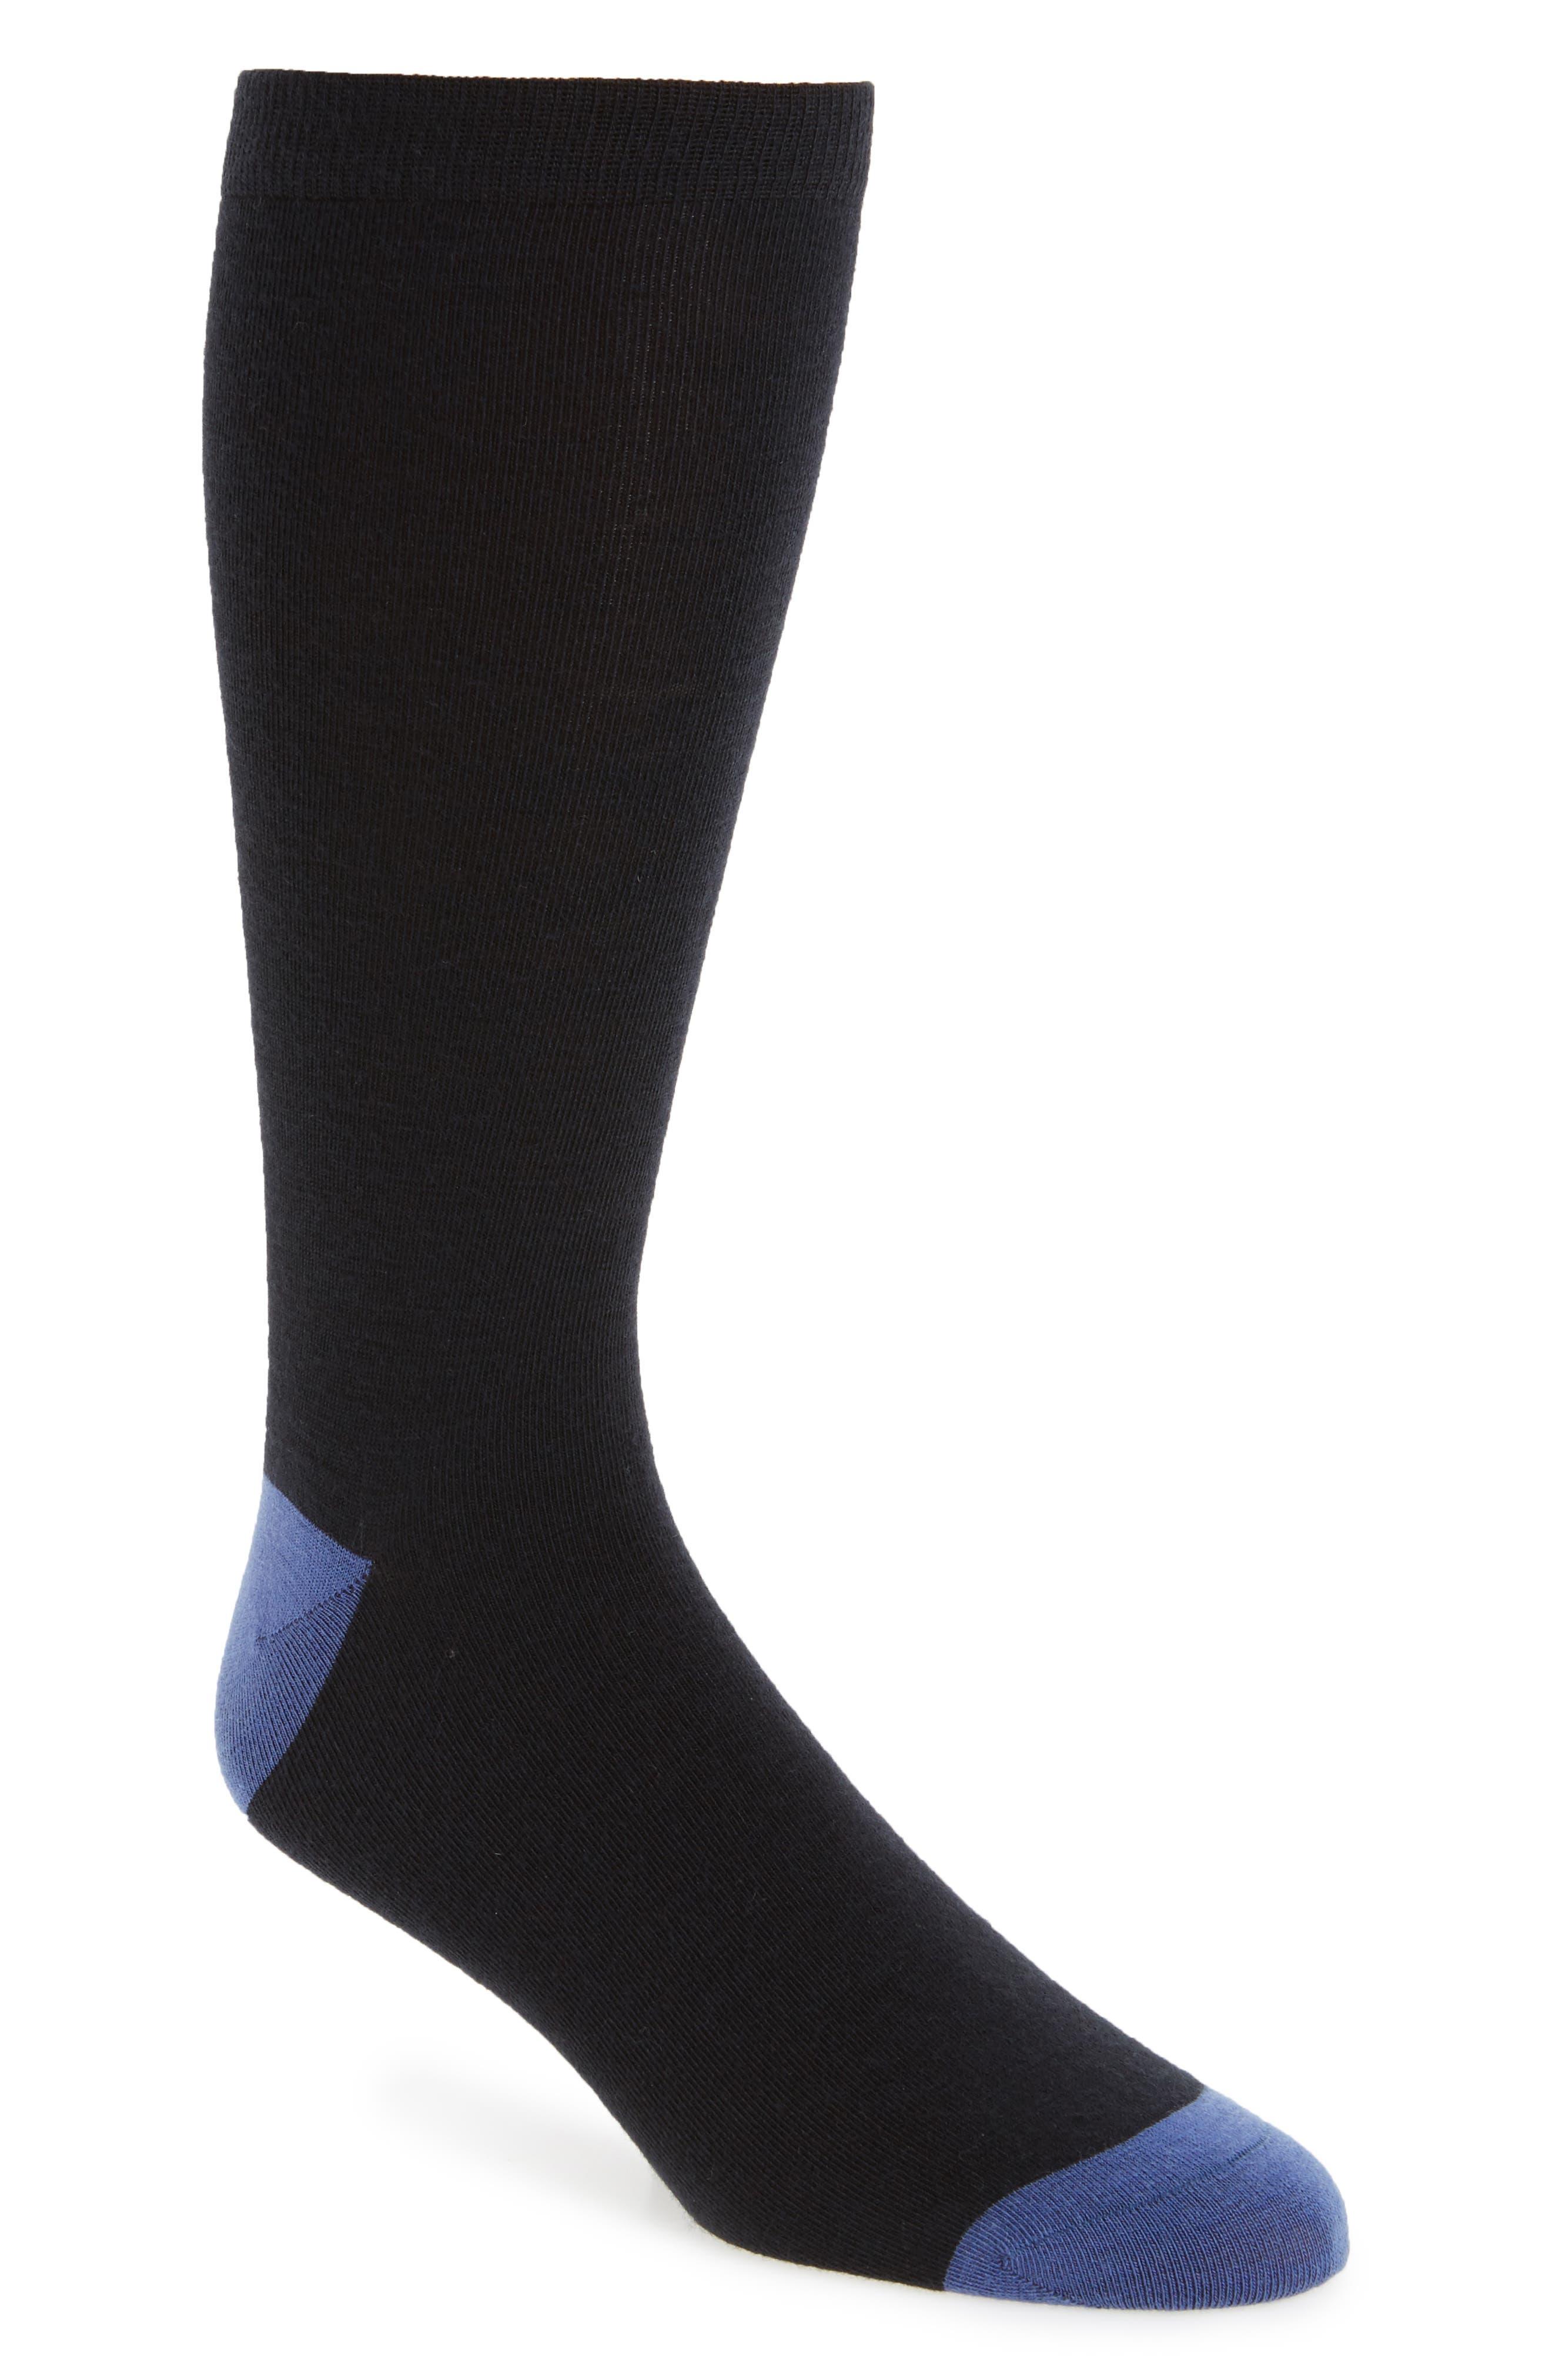 Colorblock Socks,                         Main,                         color, 001